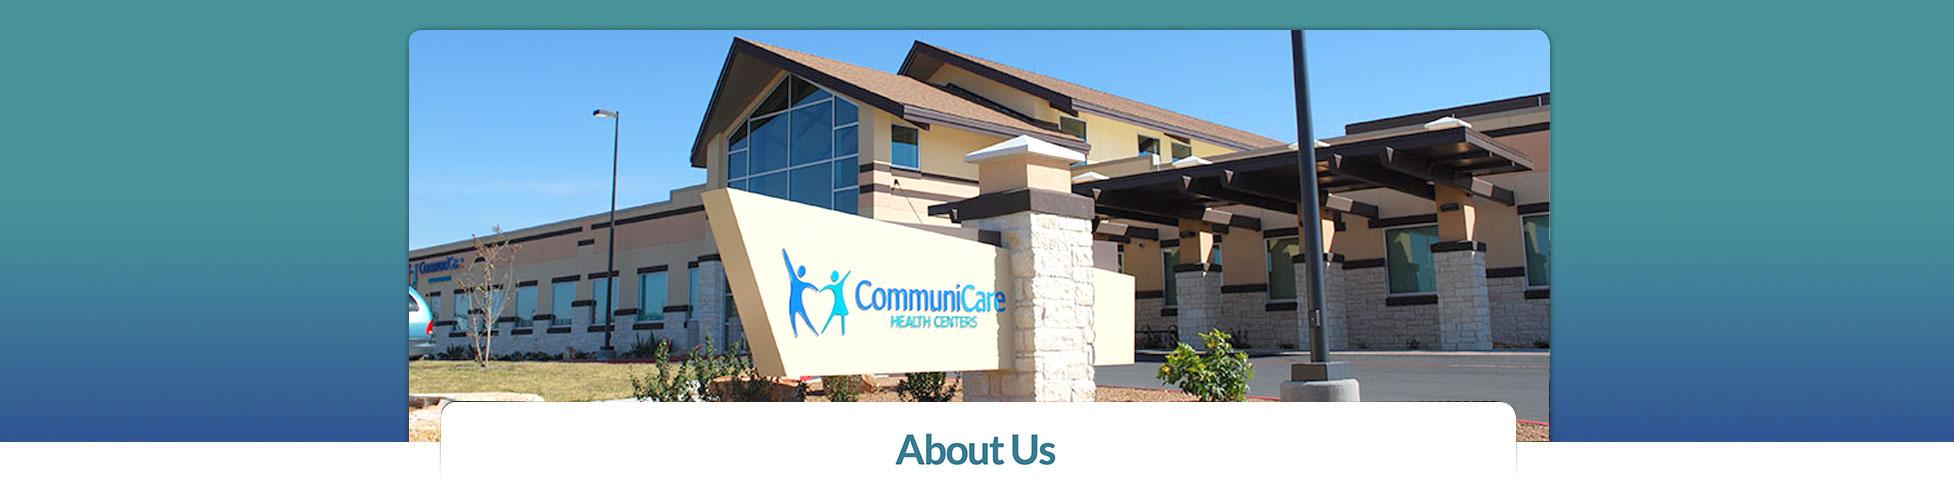 Communicare Health Center Kyle Tx Communicare Health Centers